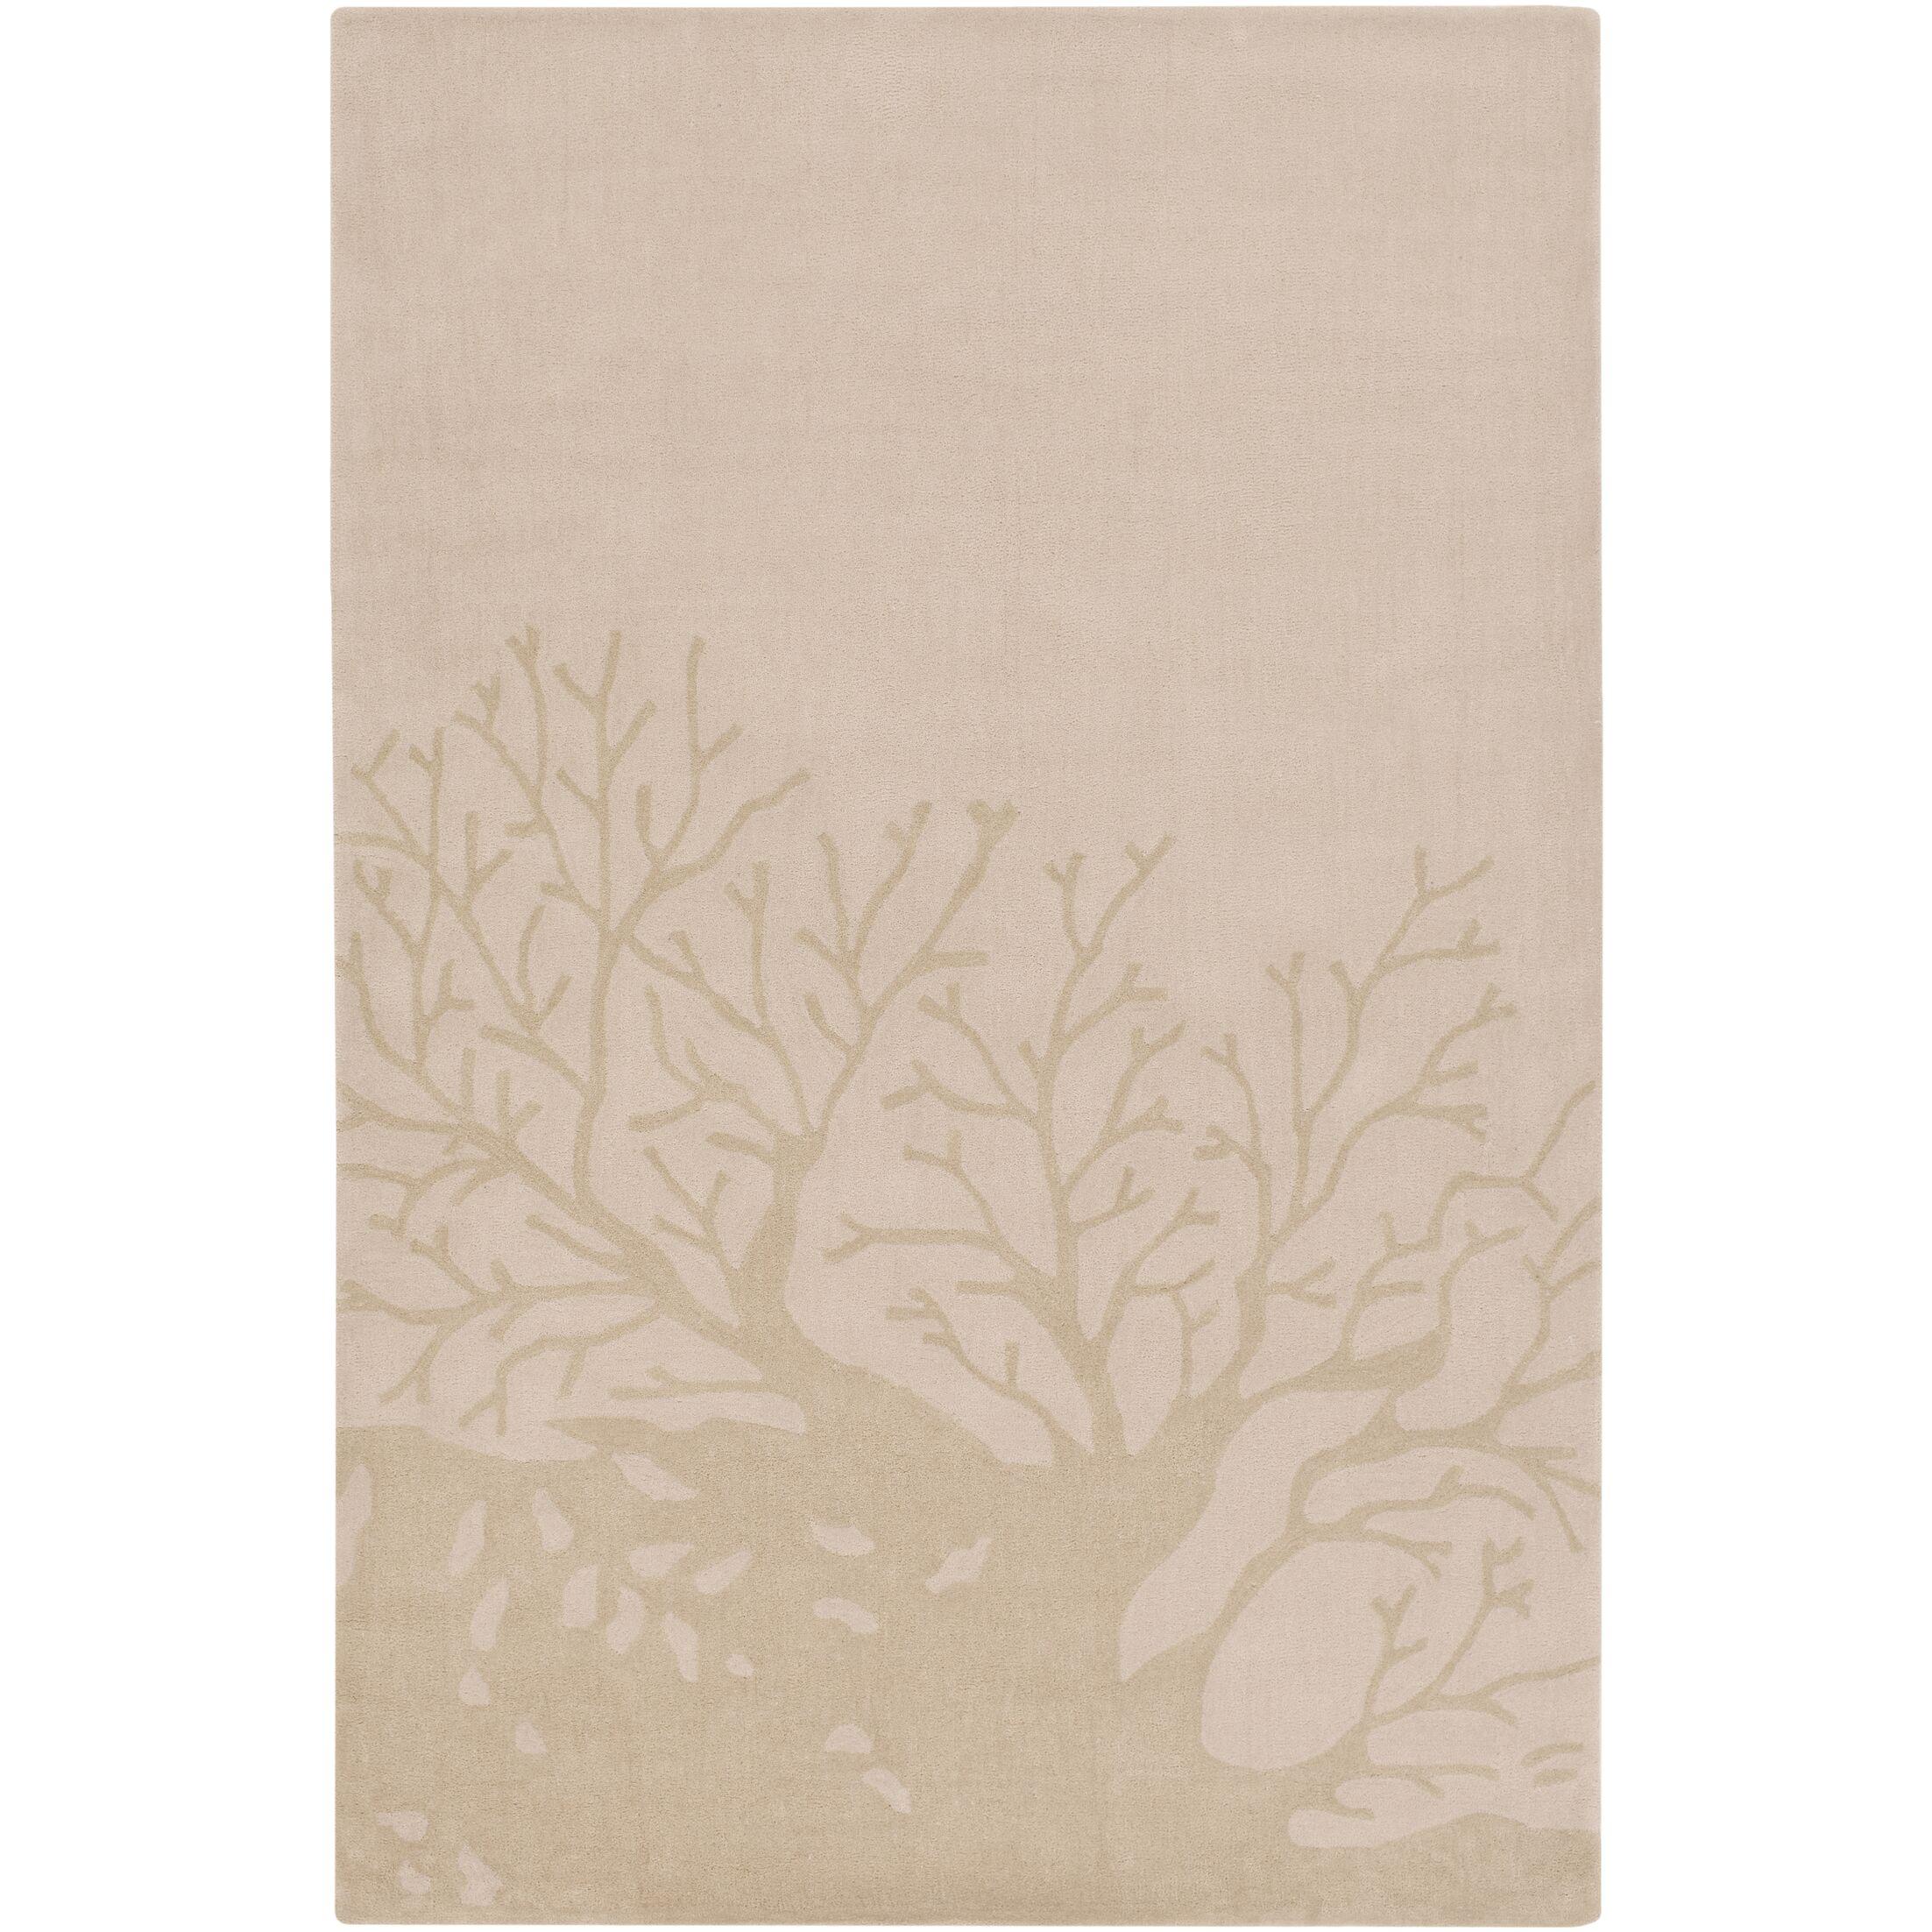 Charlestown Hand-Tufted Blush/Khaki Area Rug Rug Size: Rectangle 8' x 10'